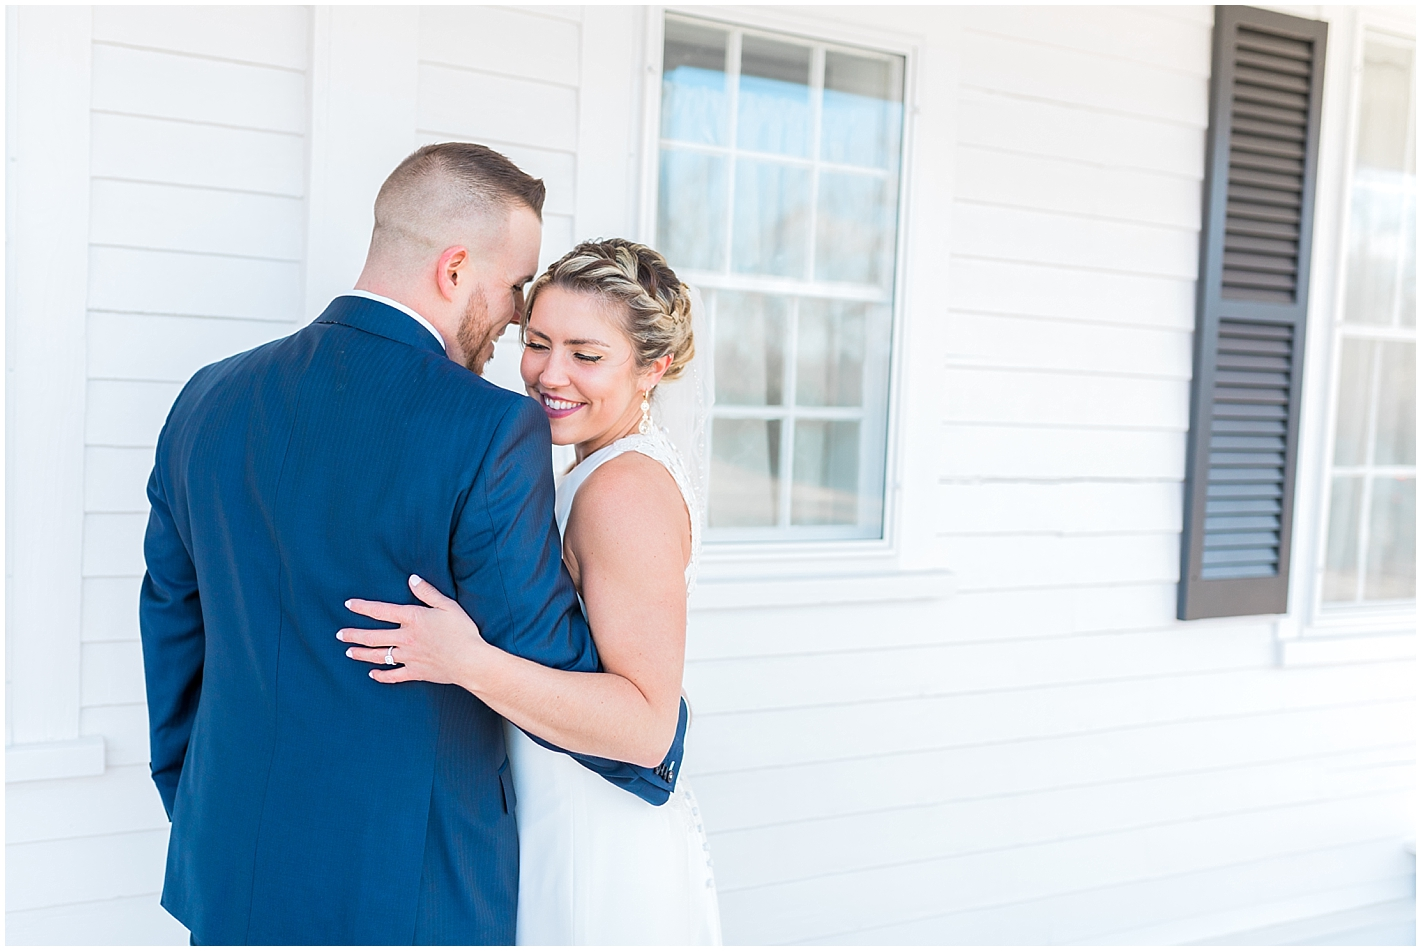 Romantic Wedding Photos by Alyssa Parker Photography